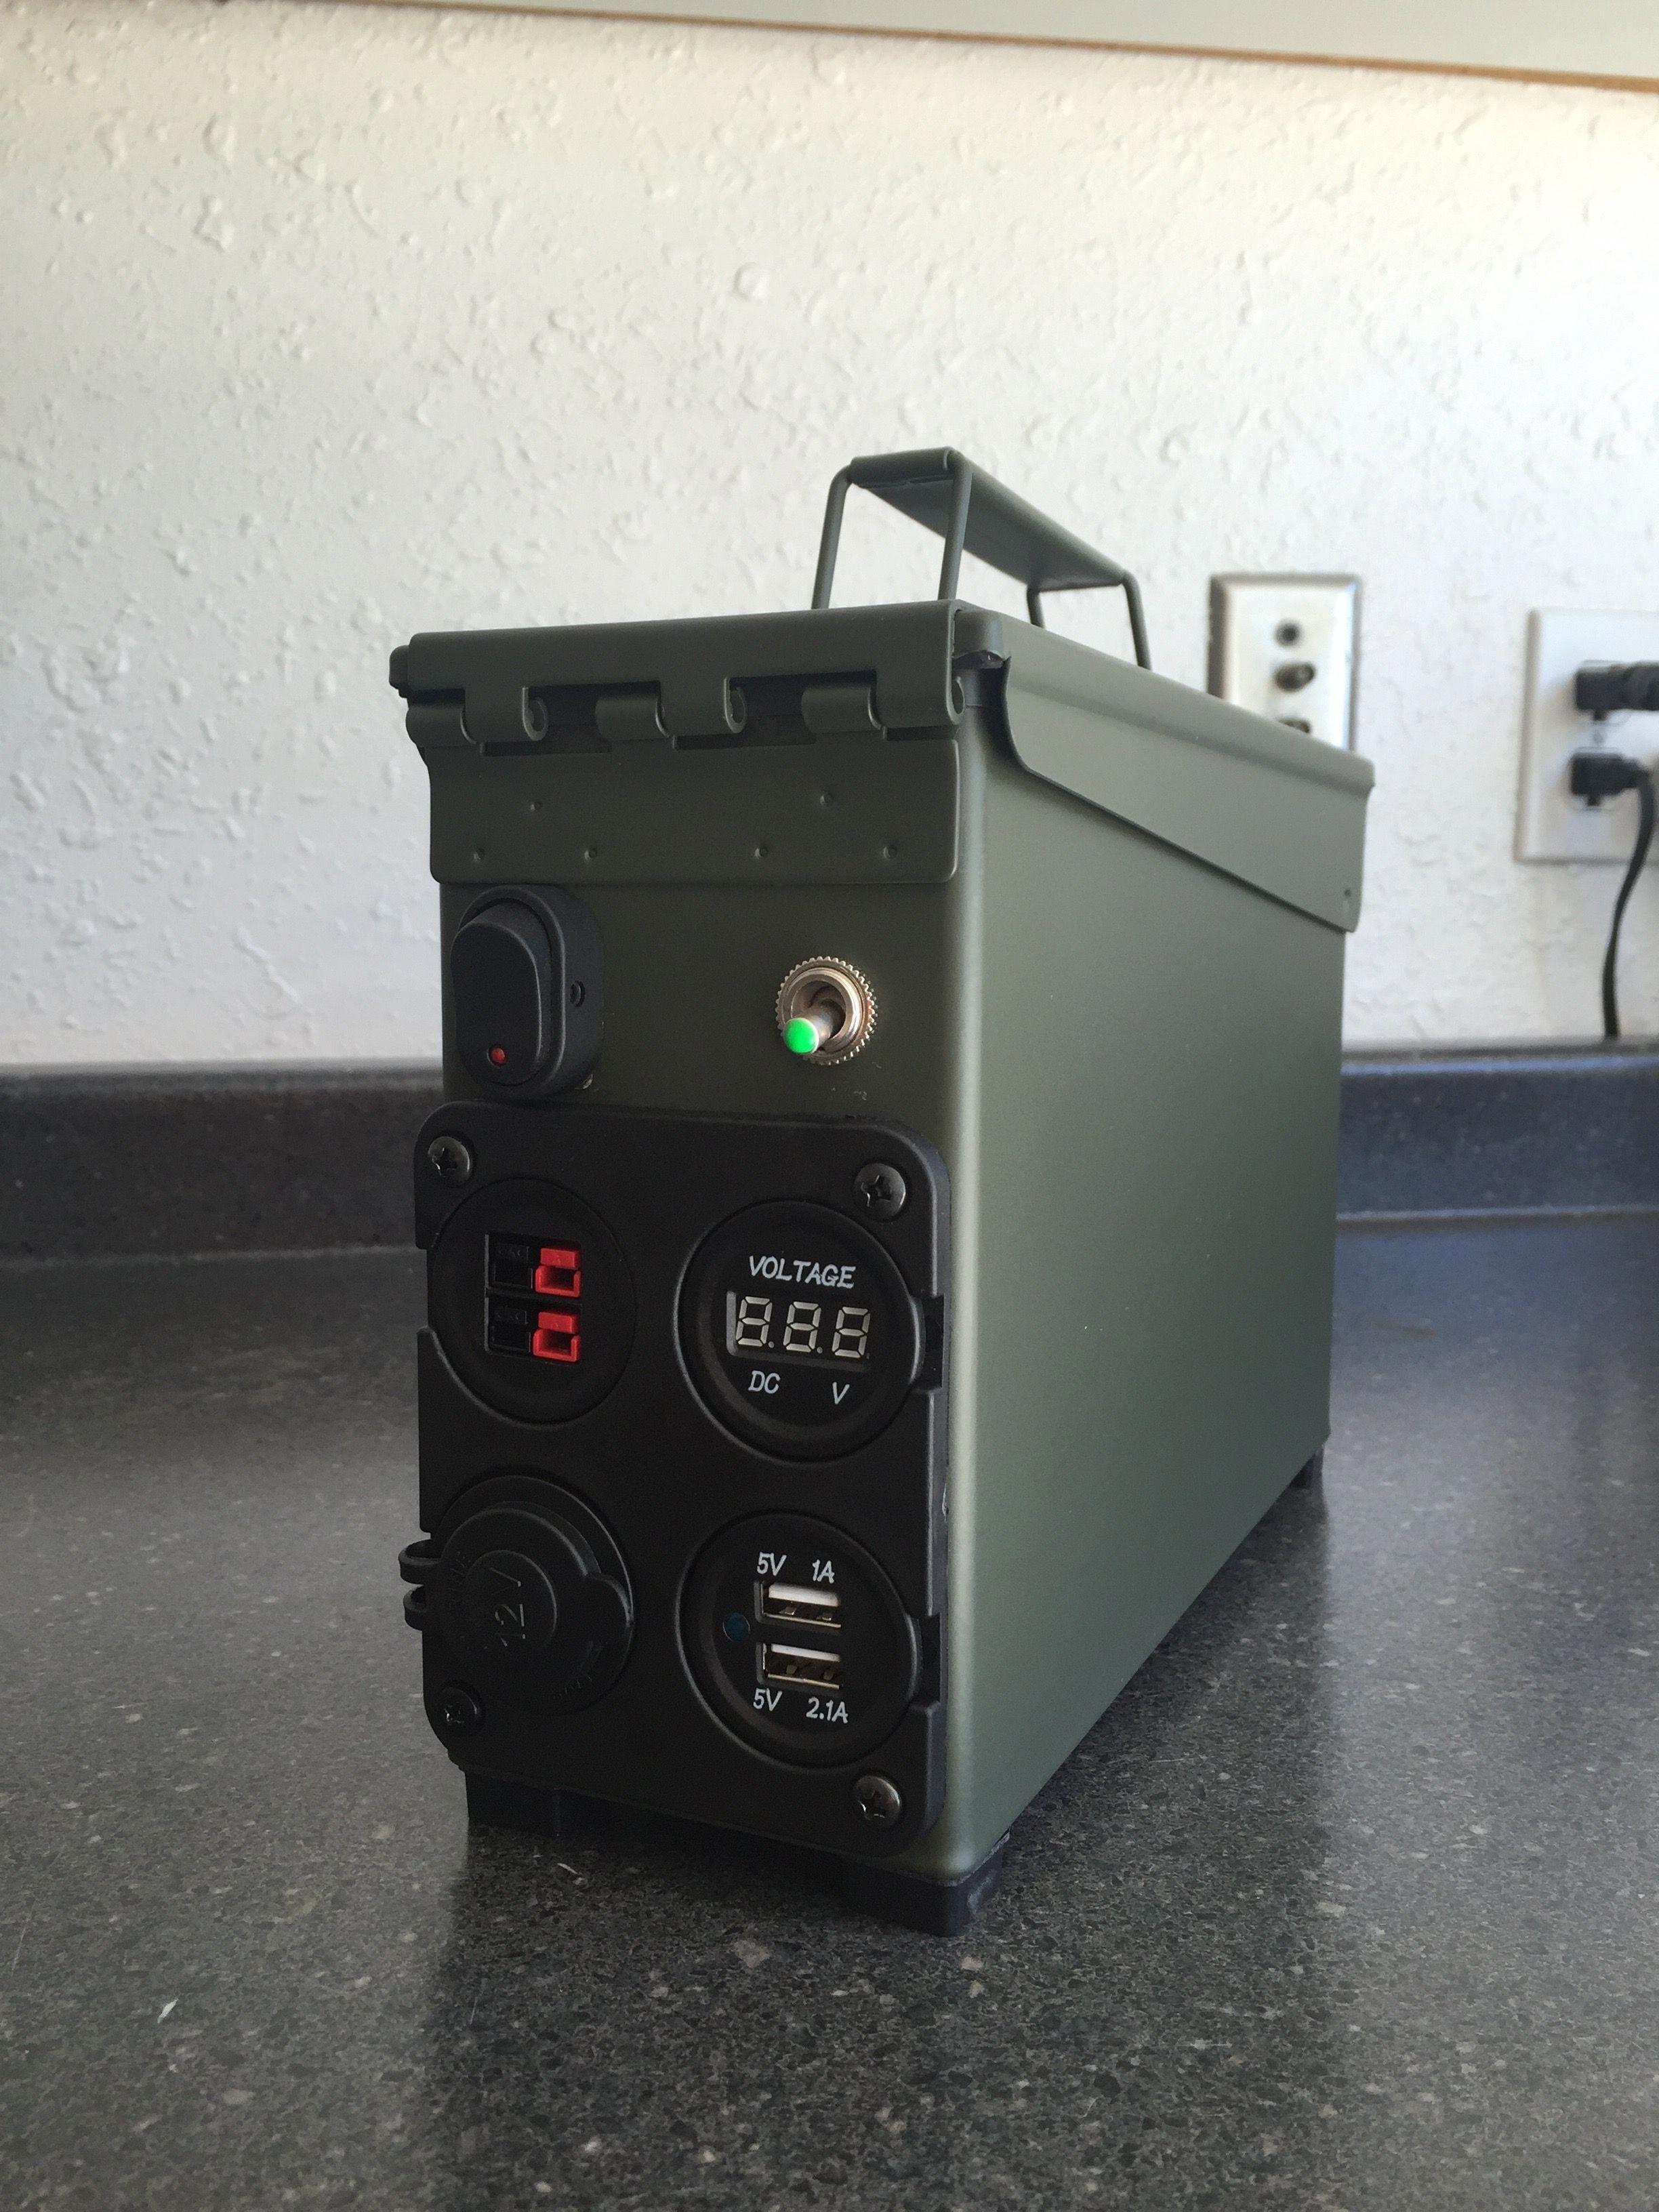 SHTF Battery Box 17Ah By N6VOA   Tech   Ham radio, Ammo cans